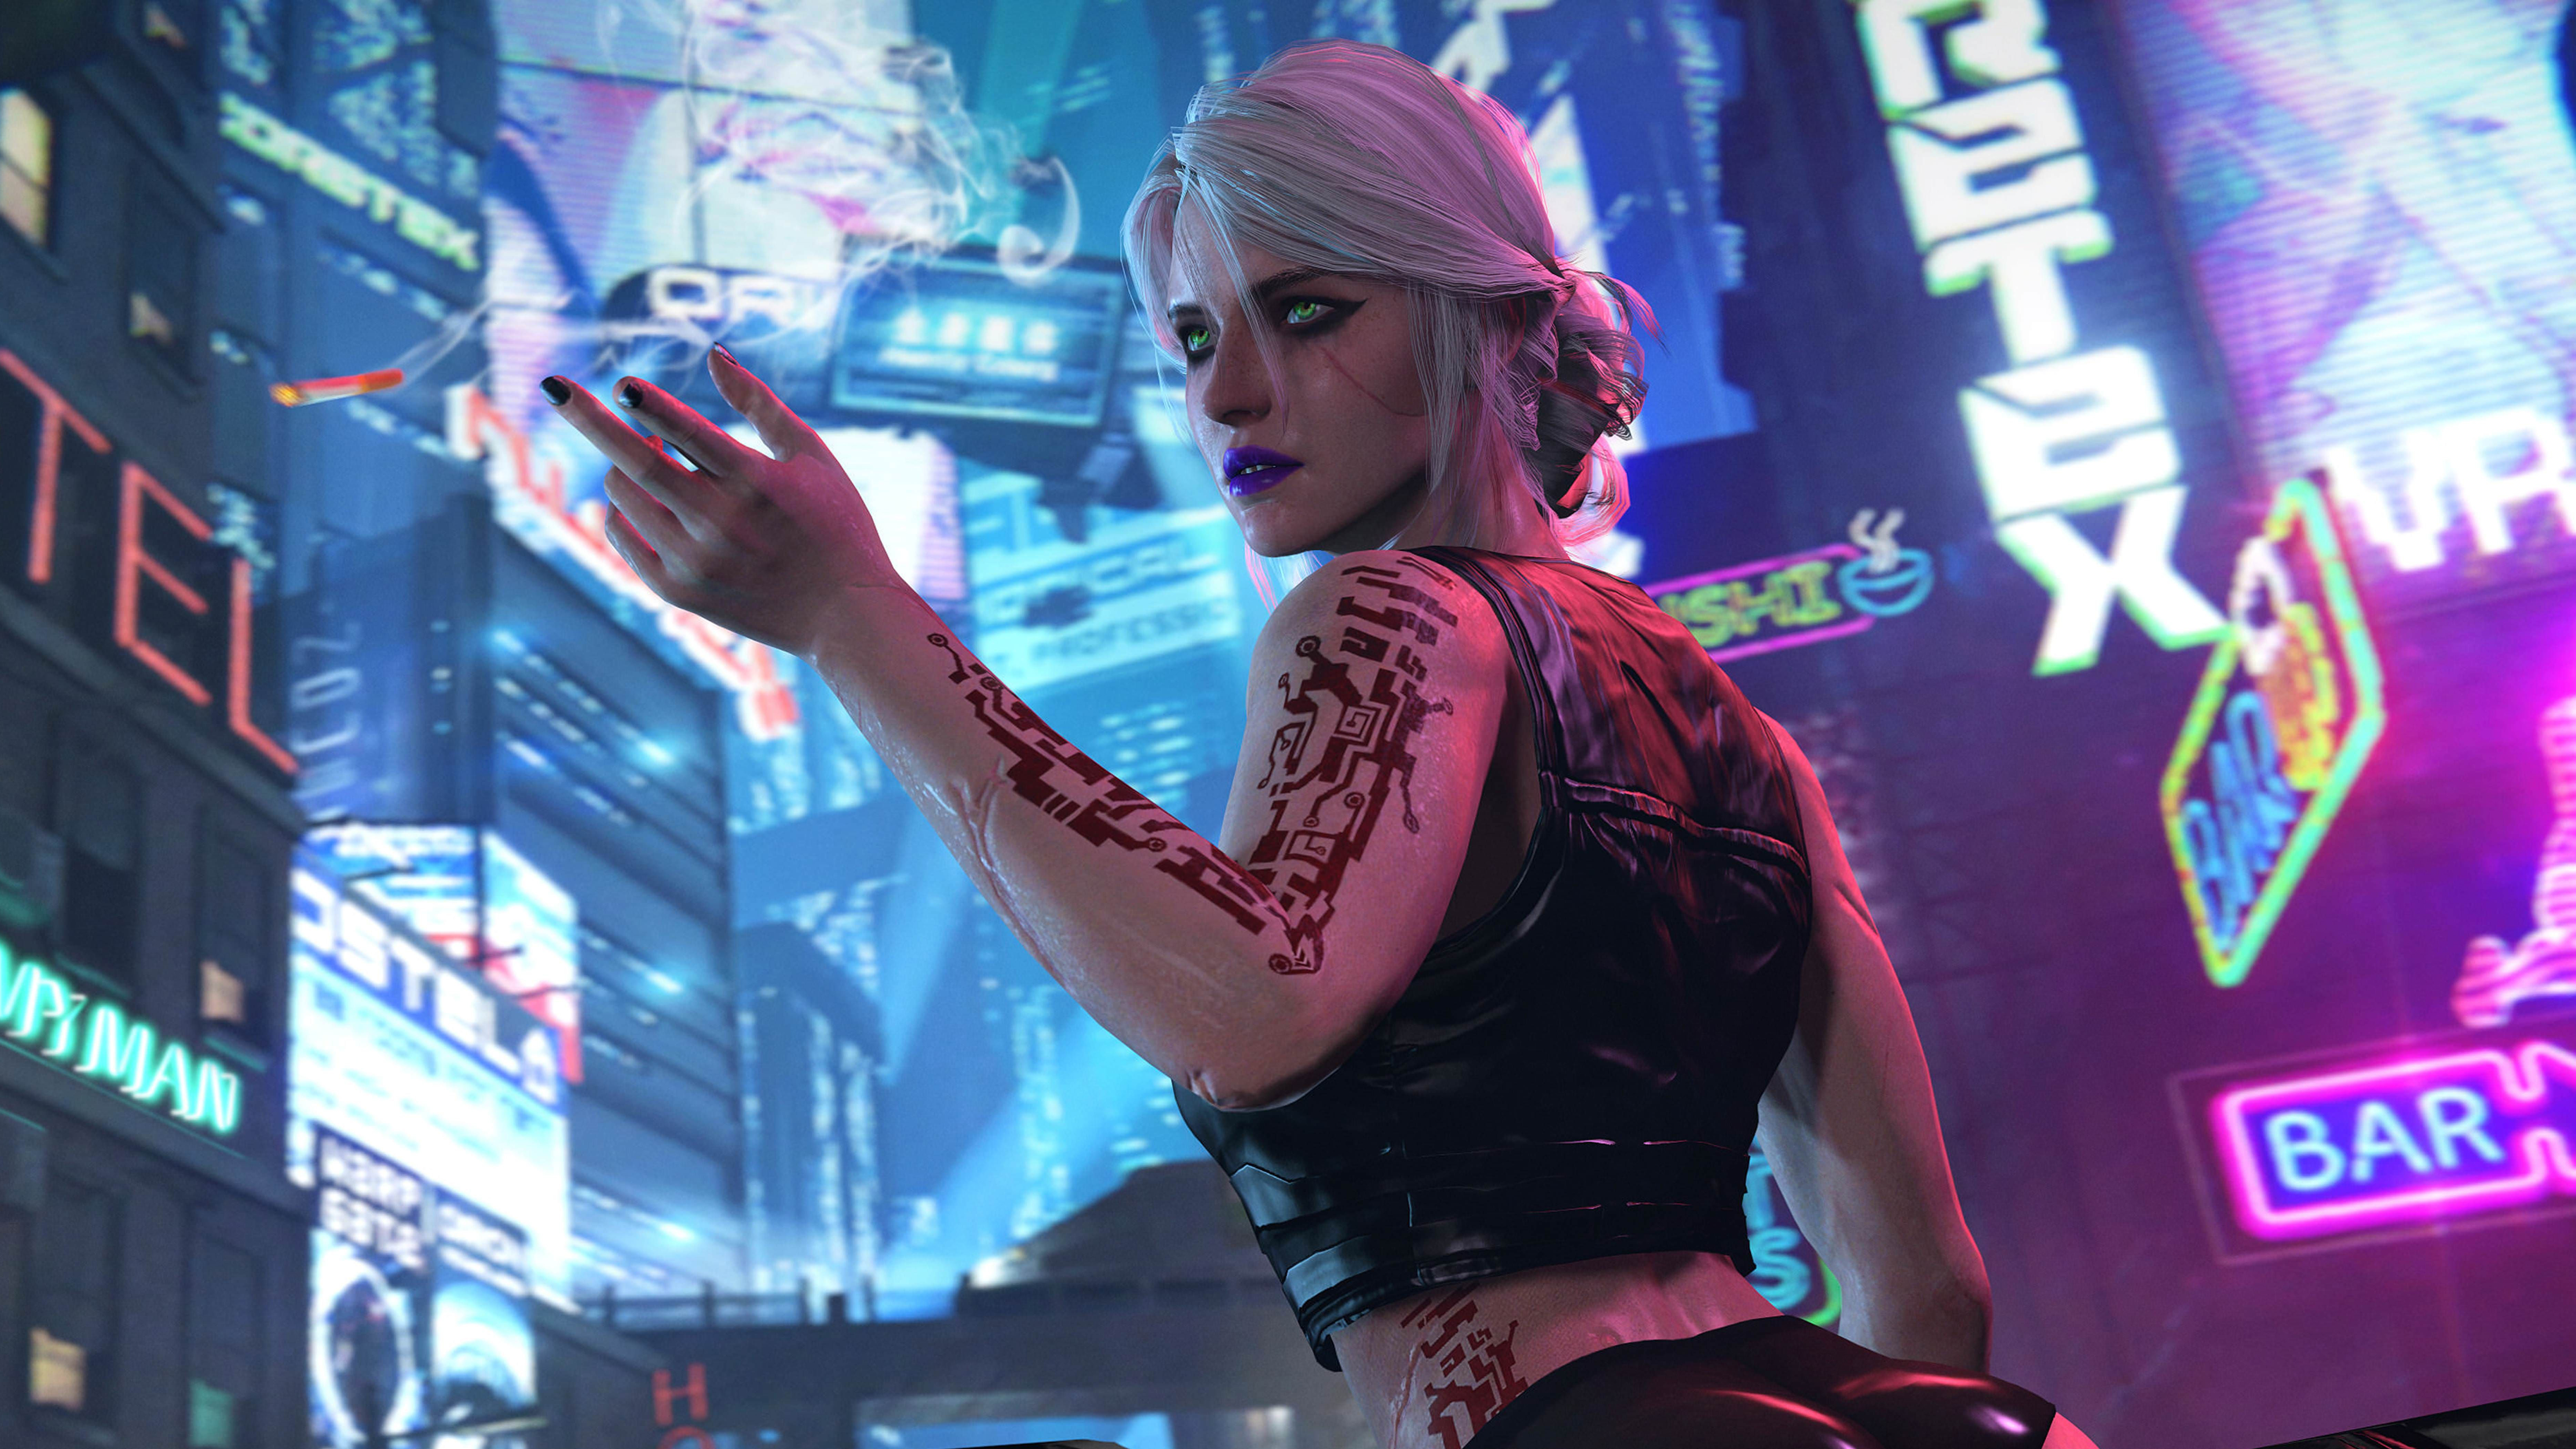 Ciri Cyberpunk 2077, HD Games, 4k Wallpapers, Images